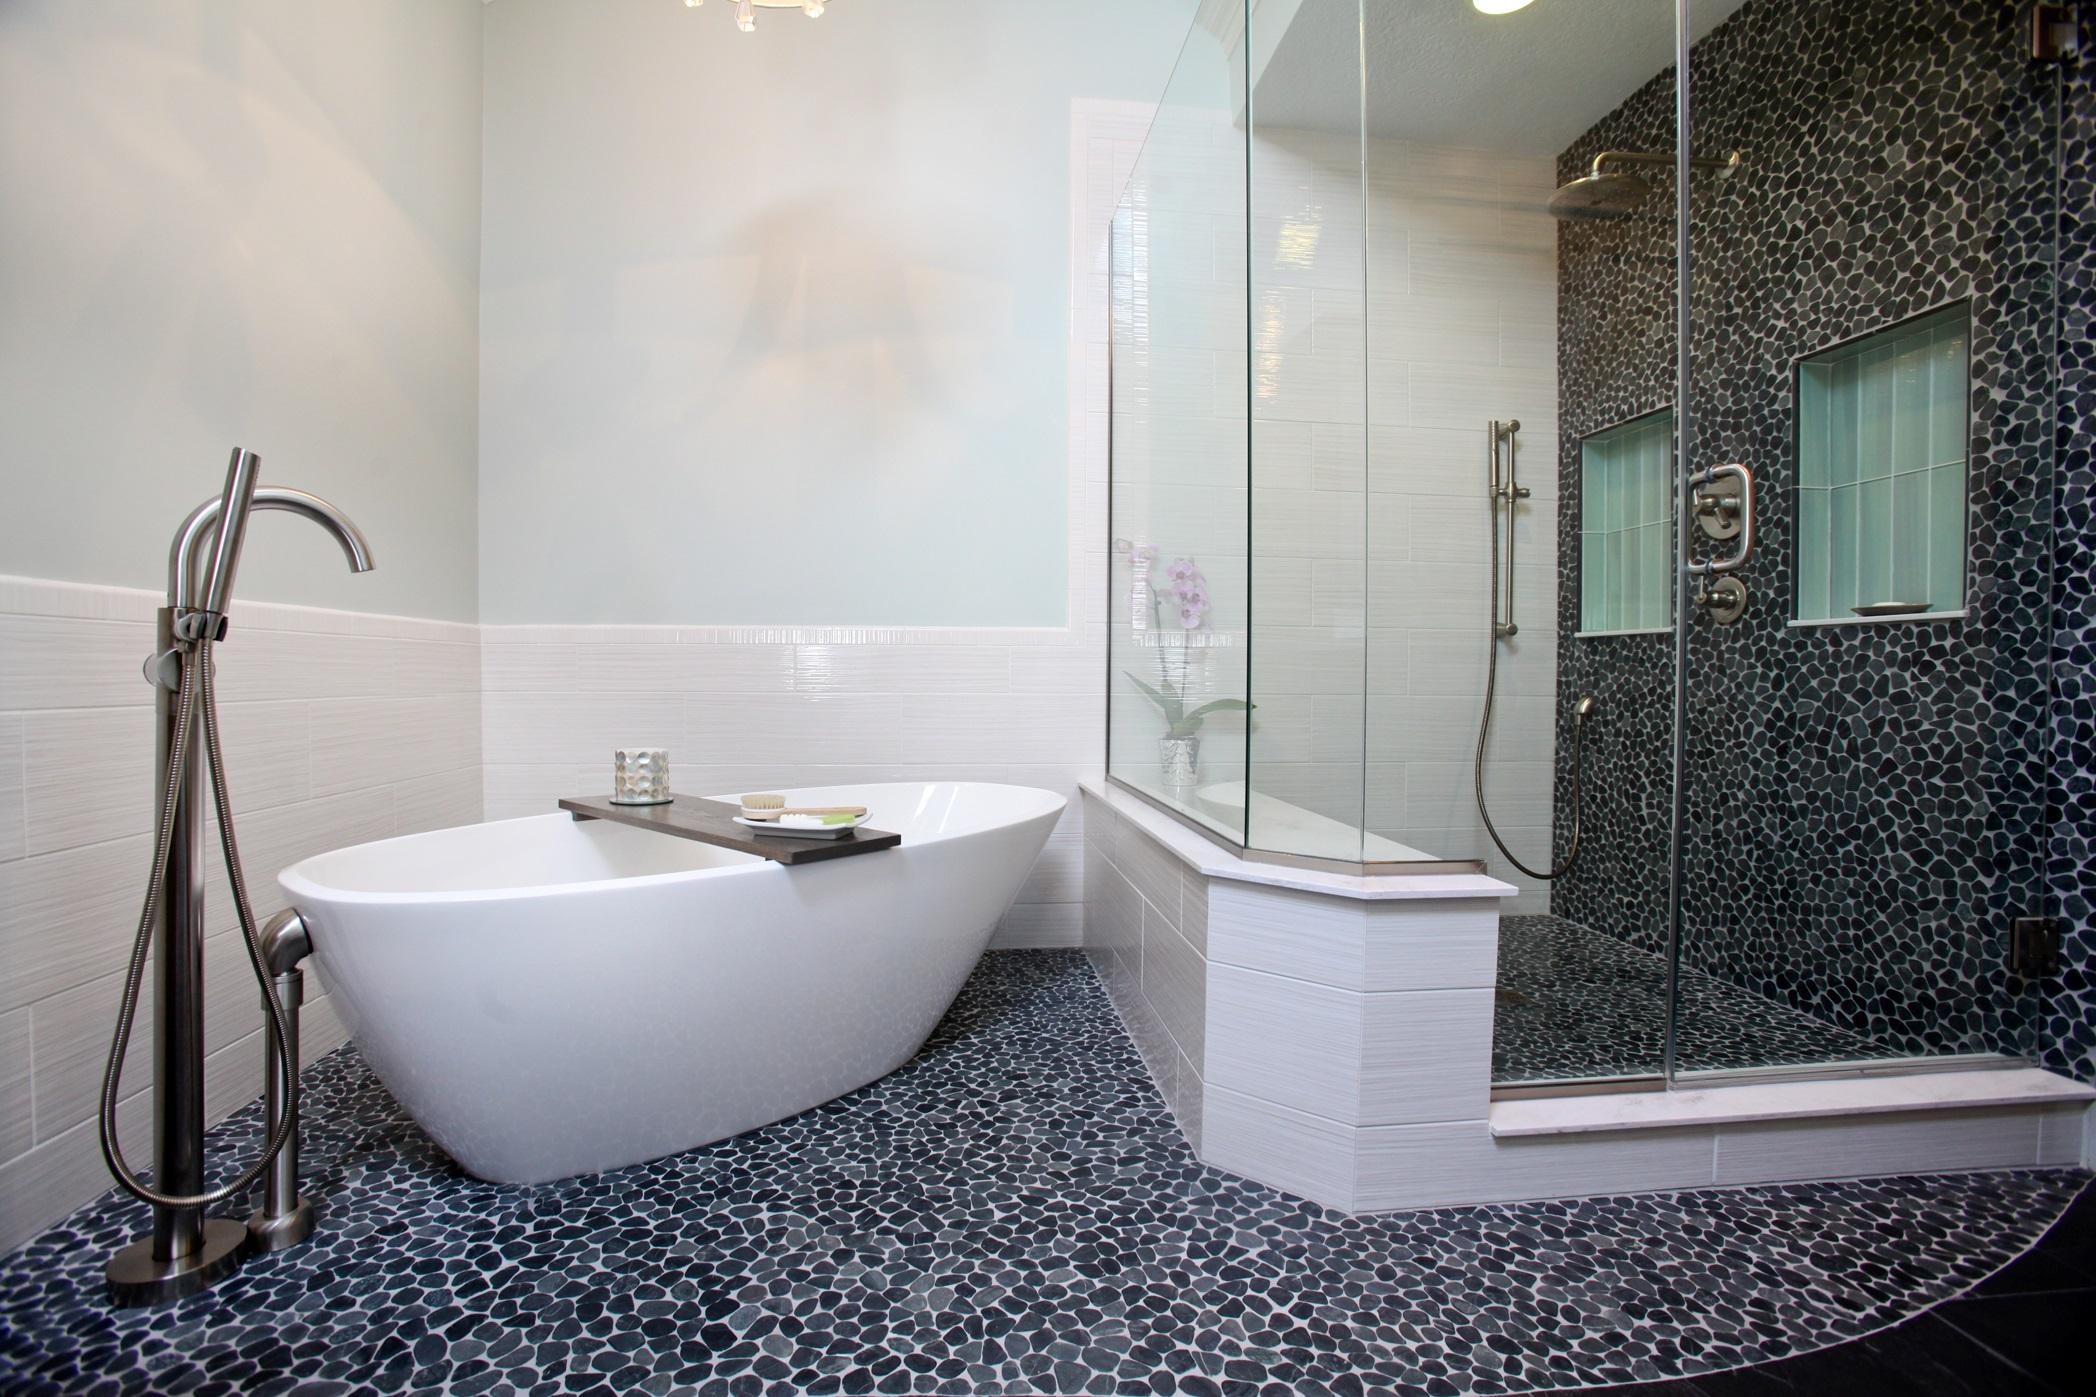 Column Master Bath Design With Resale In Mind Current Publishing